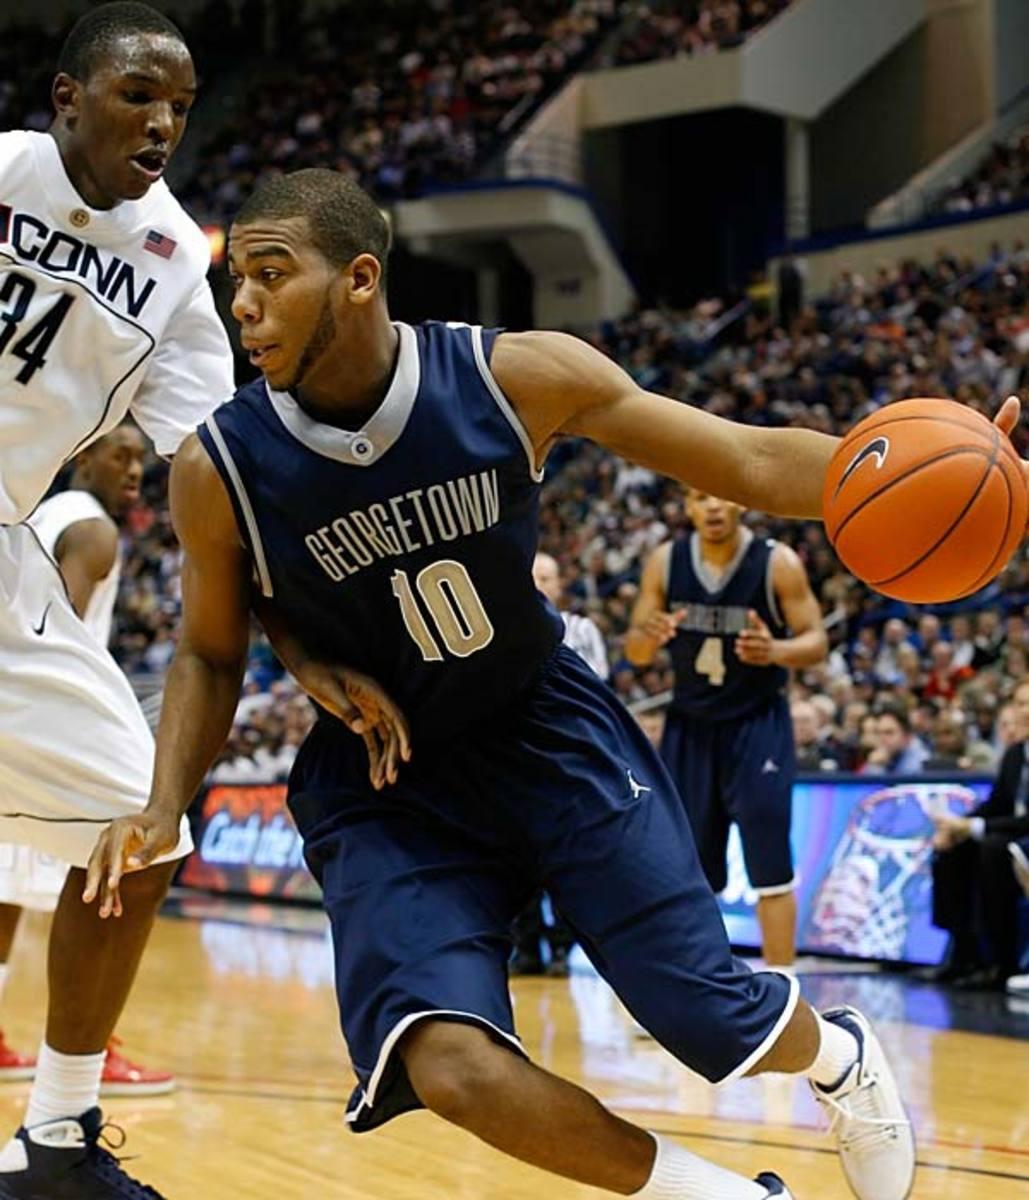 Georgetown at Notre Dame, 7 p.m., Monday, ESPN